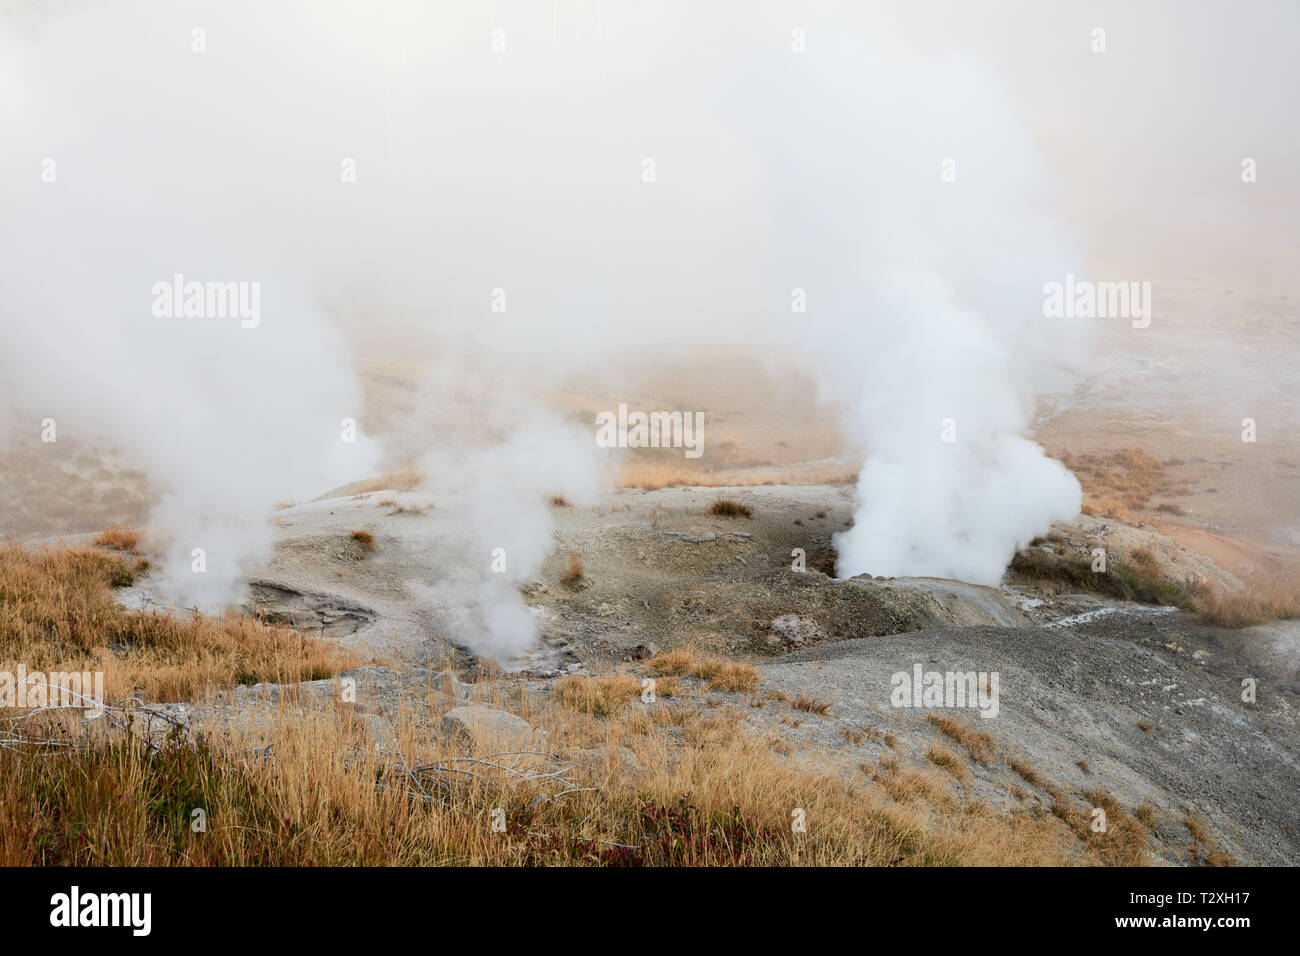 Fumaroles in Norris Geyser Basin, Yellowstone National Park - Stock Image